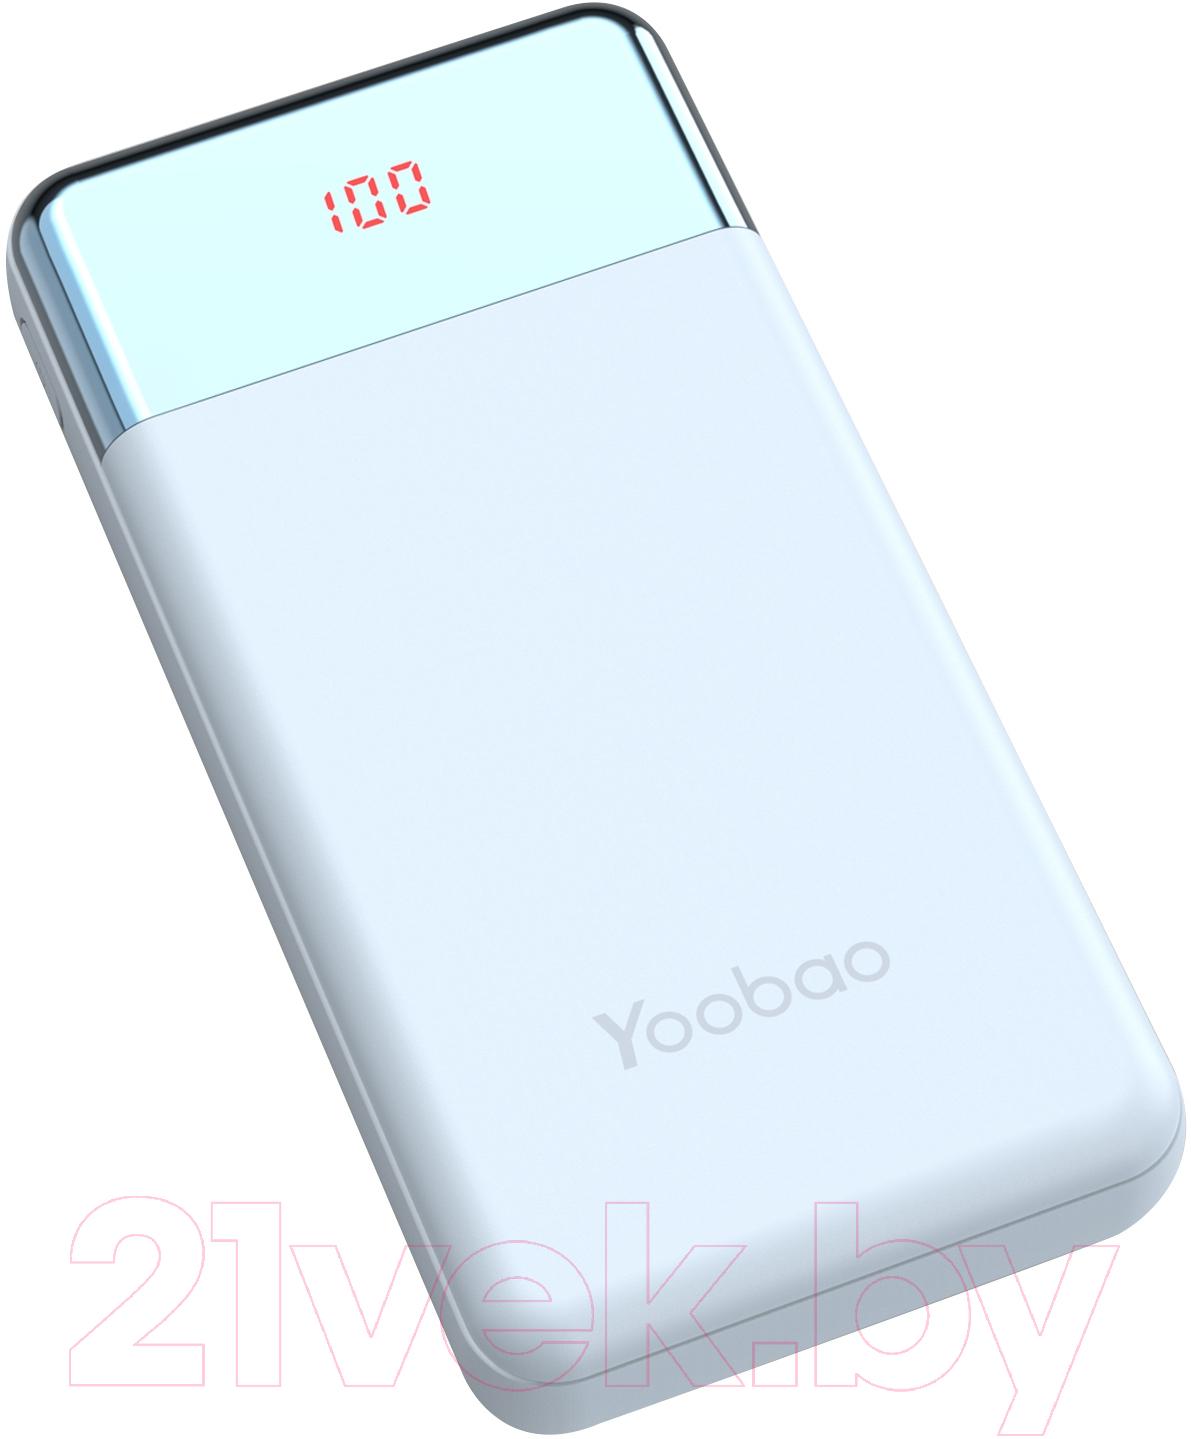 Купить Портативное зарядное устройство Yoobao, Power Bank PD 30W (синий), Китай